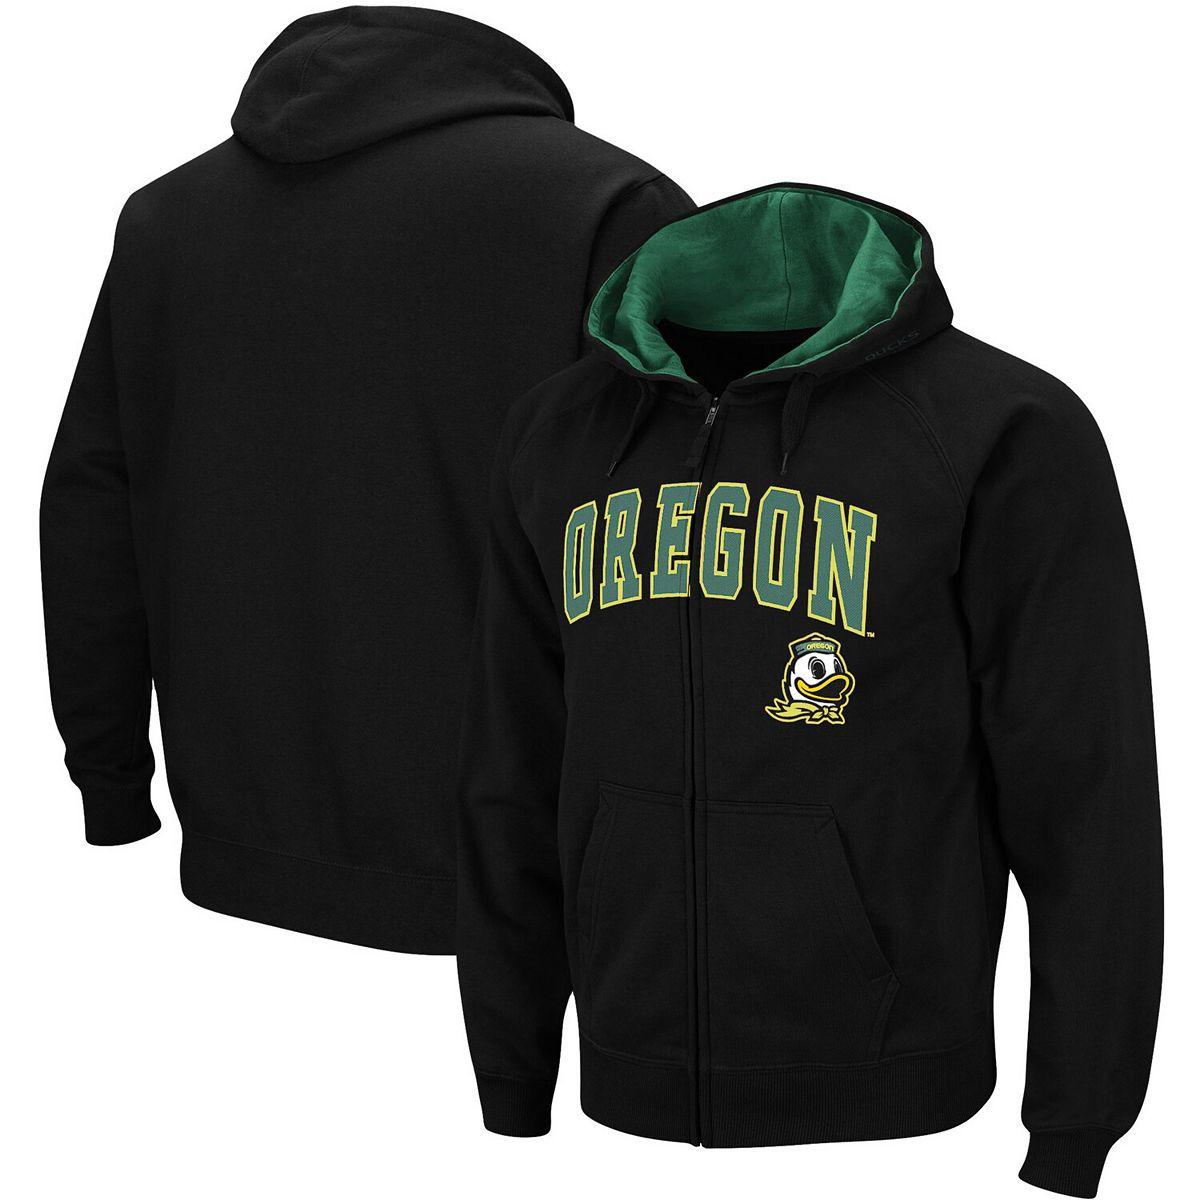 Men's Black Oregon Ducks Arch & Logo Tackle Twill Full-Zip Hoodie 7WJL9